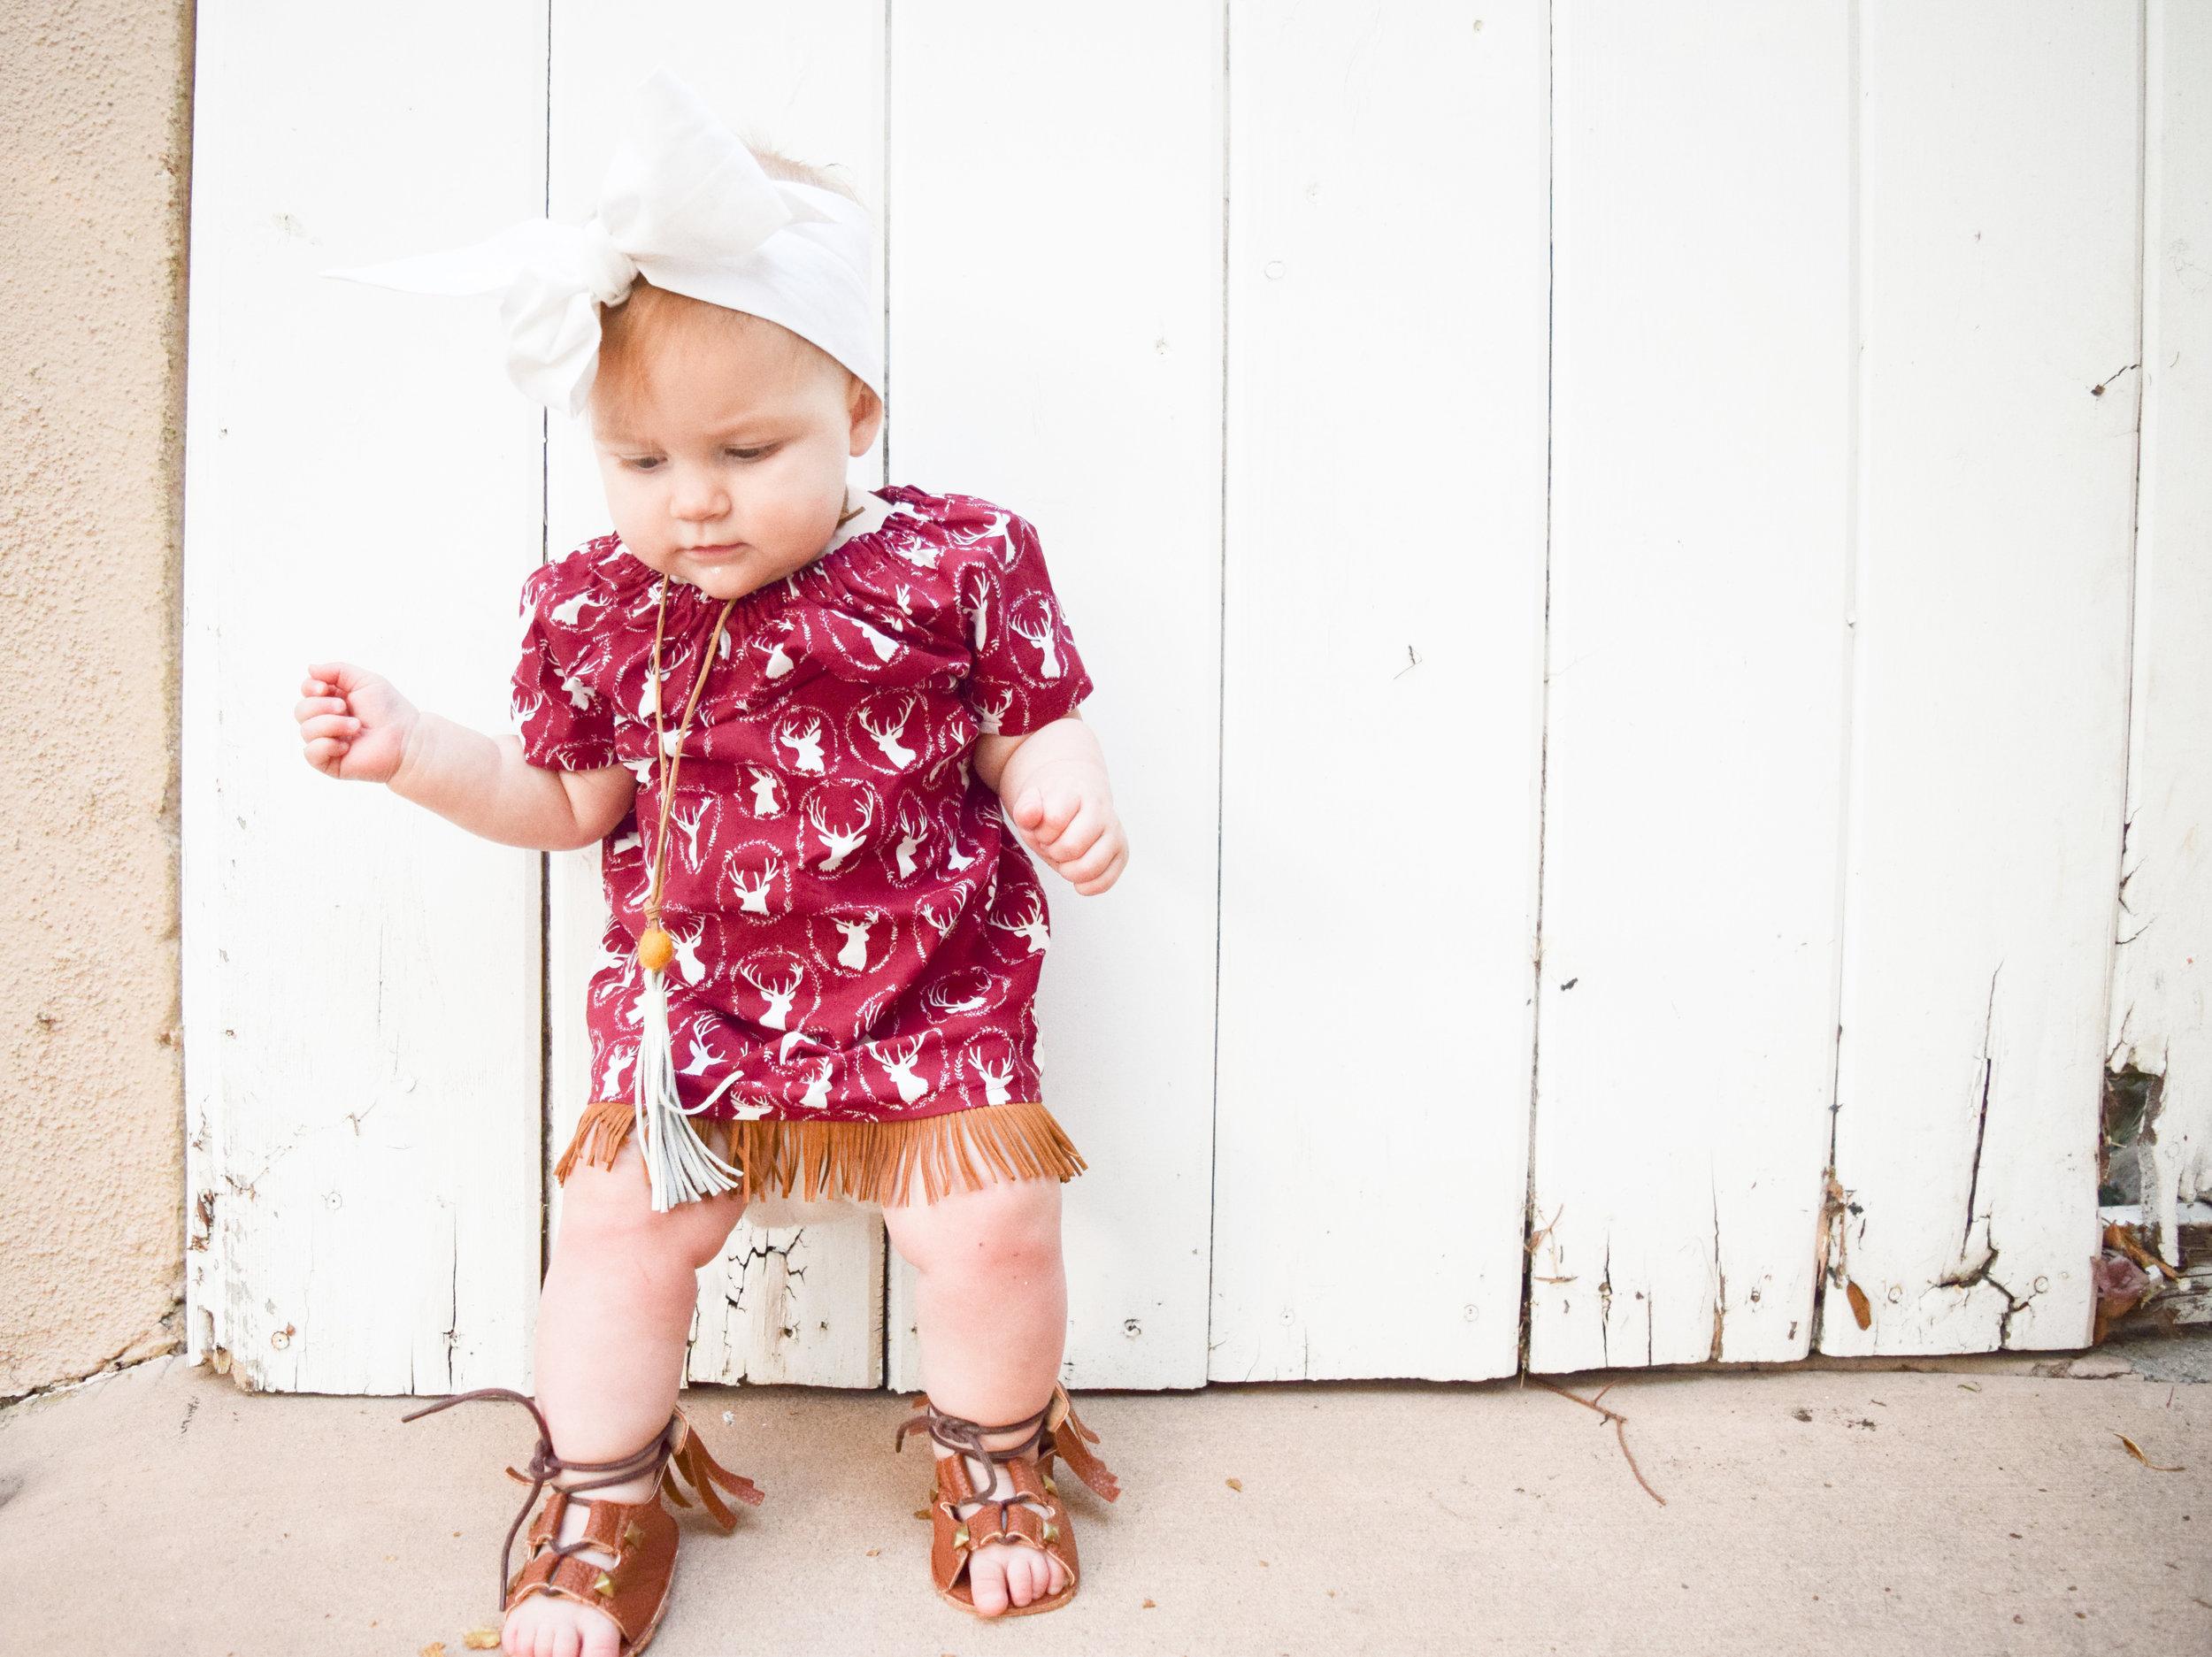 BABY FASHION | Maroon Holiday Reindeer Kids Fringe Dress and Kids Room Teepee